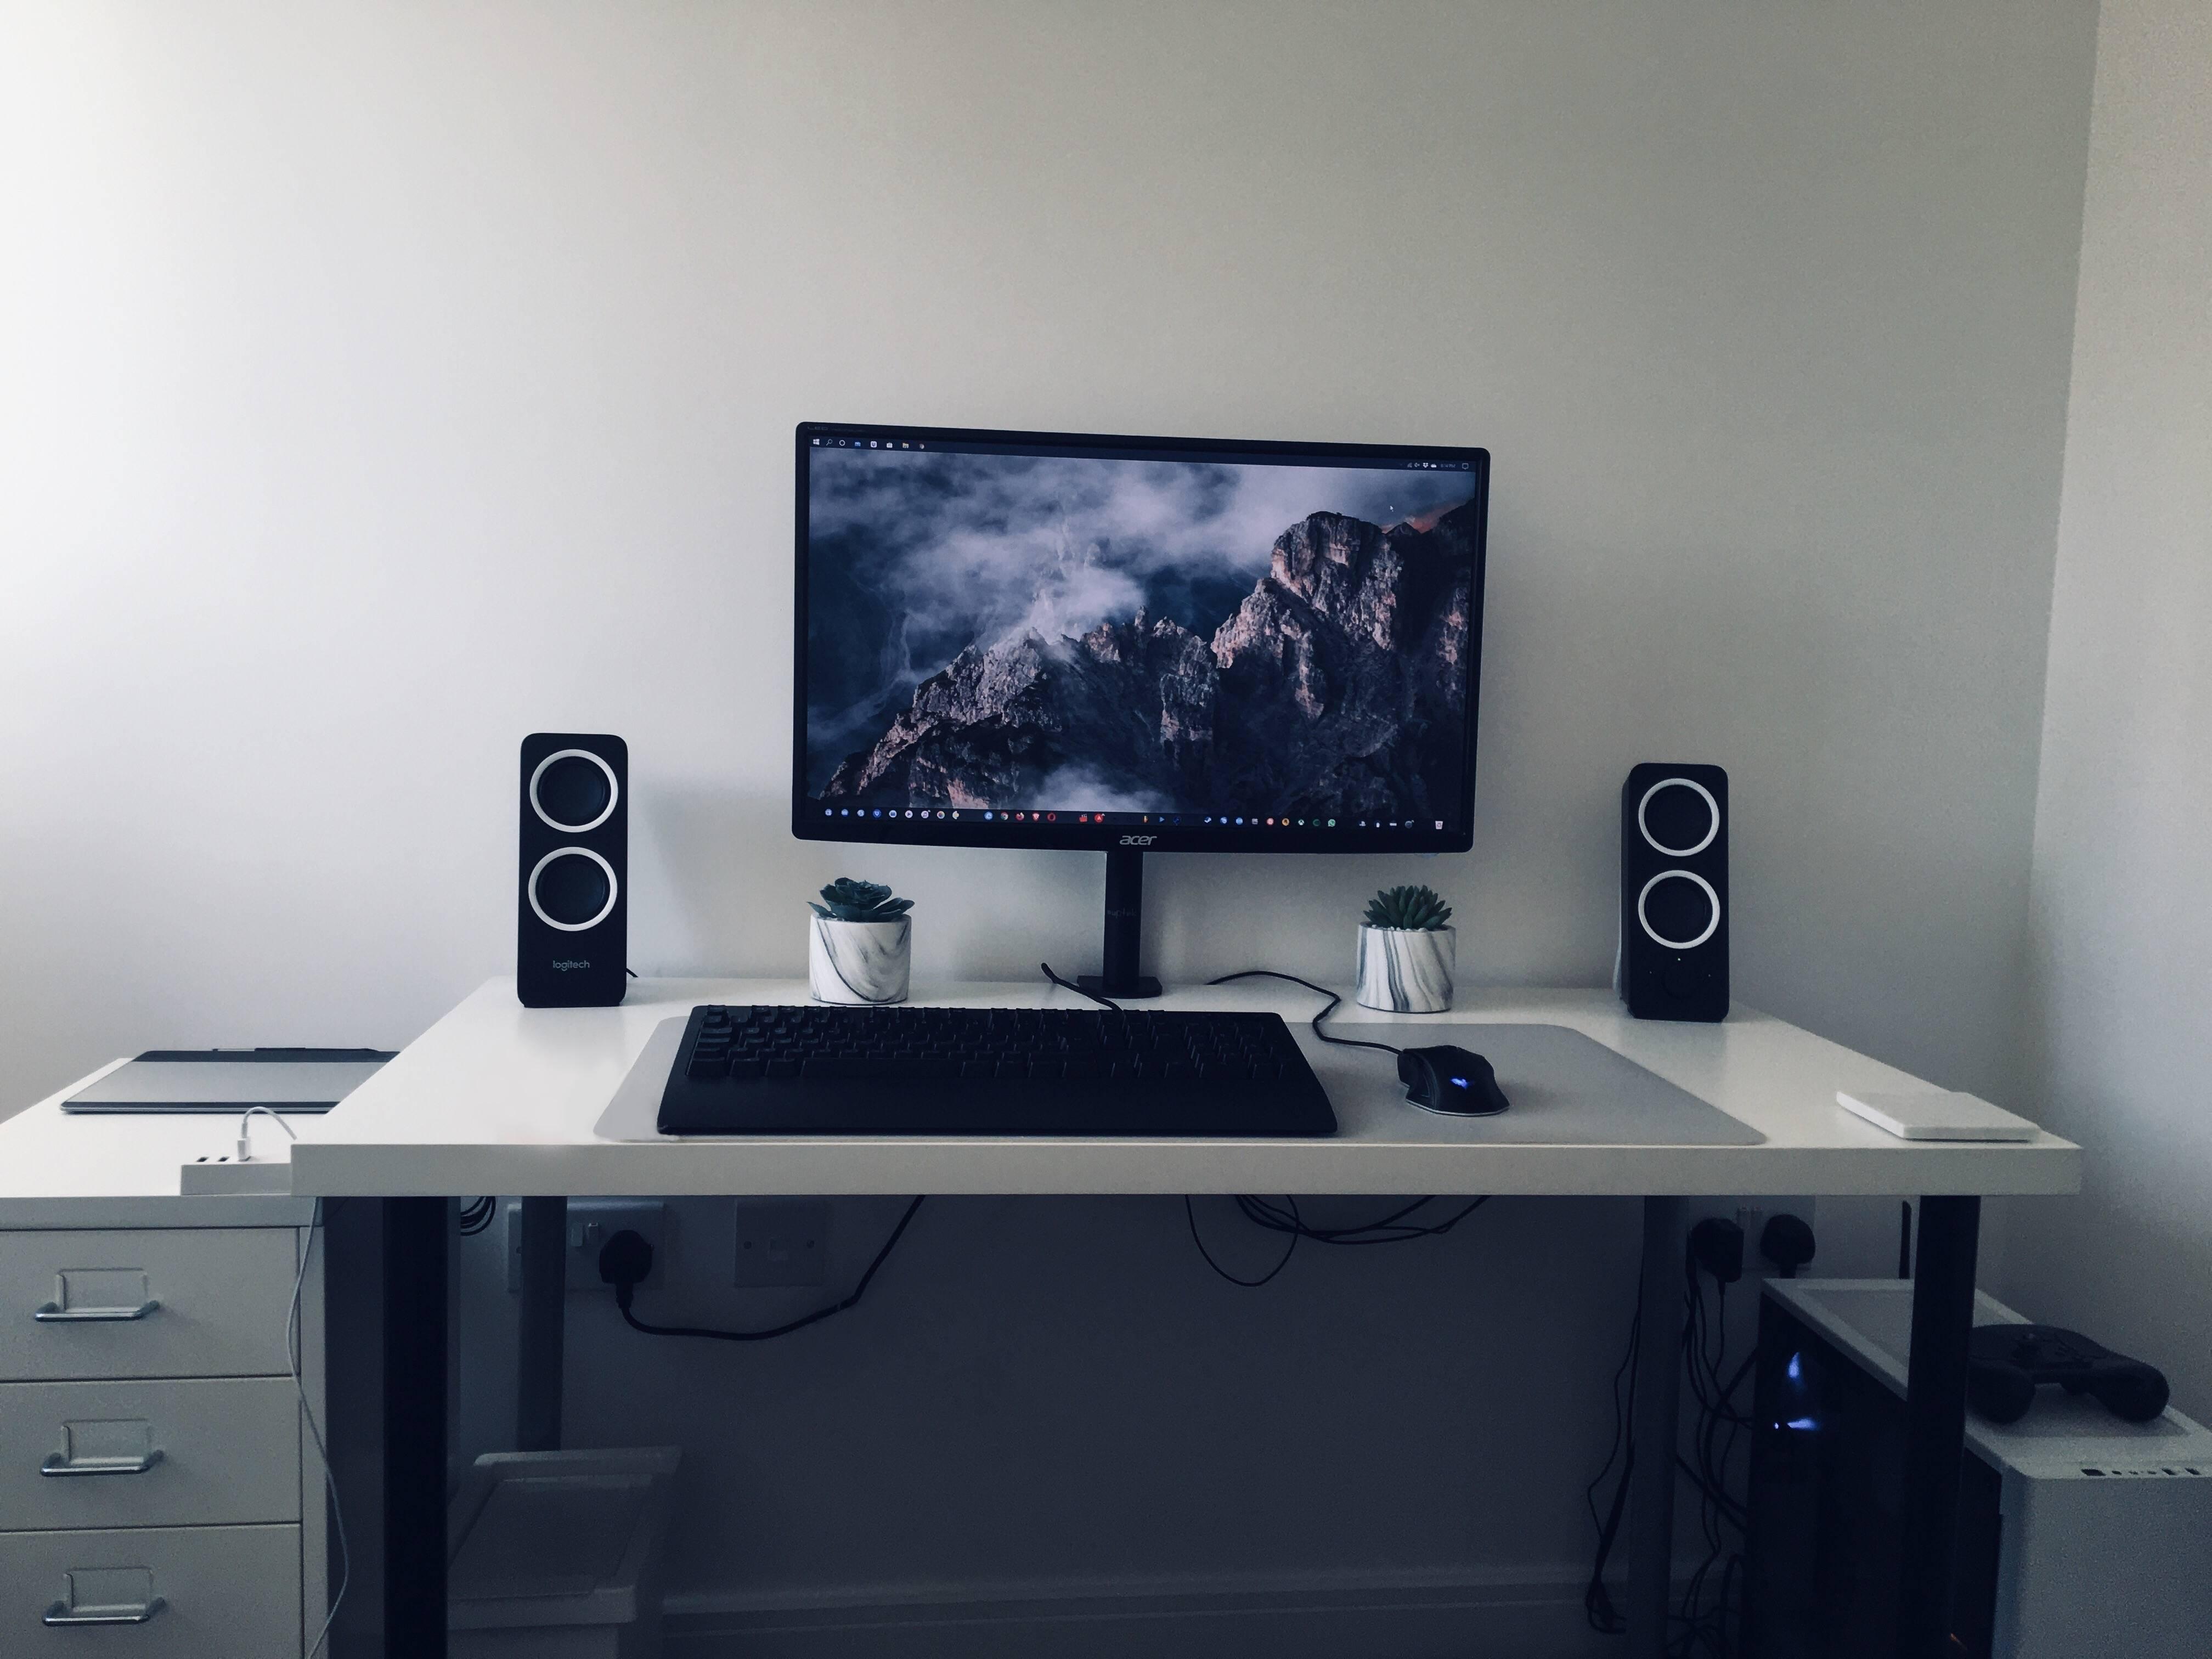 MisterYorkie's Setup - Just moved in - New desk arriving soon  | Scooget